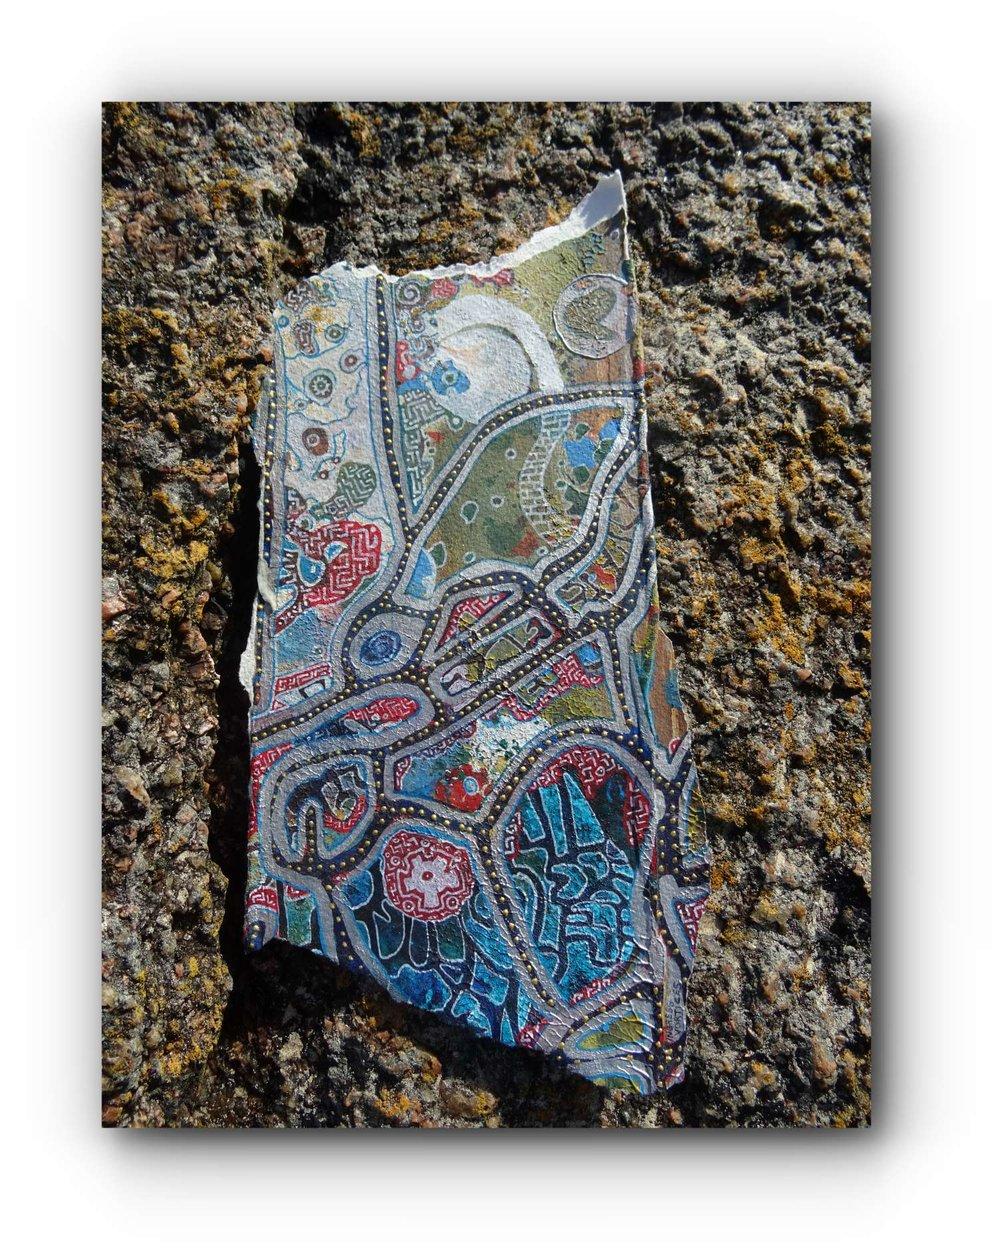 art-shamanic-seed-mundi-azul-artists-ingress-vortices.jpg